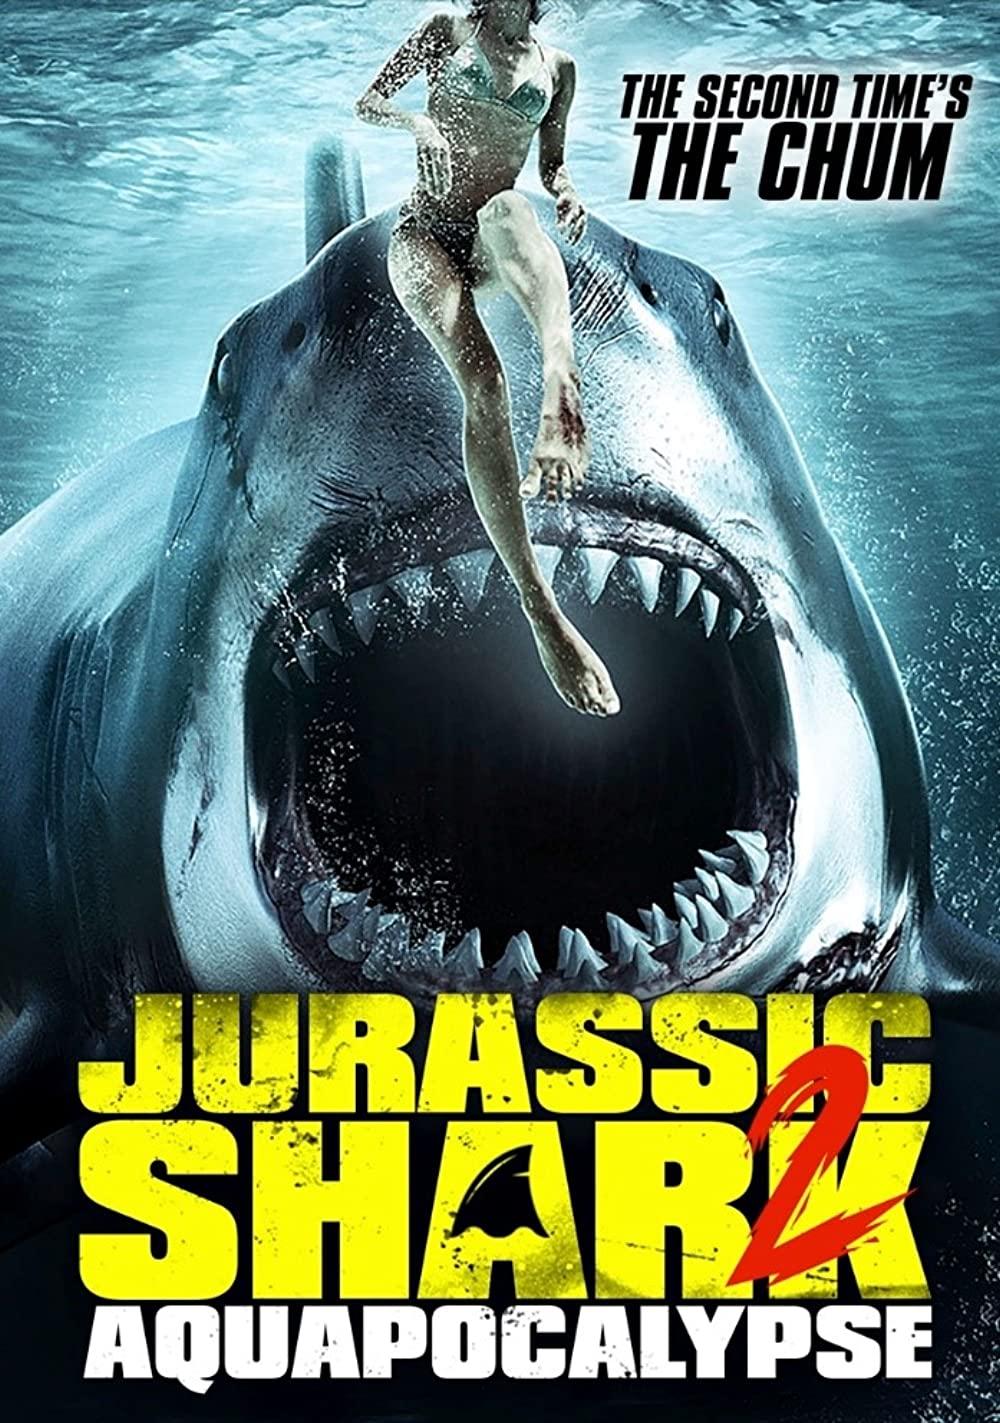 Watch Movie Jurassic Shark 2: Aquapocalypse